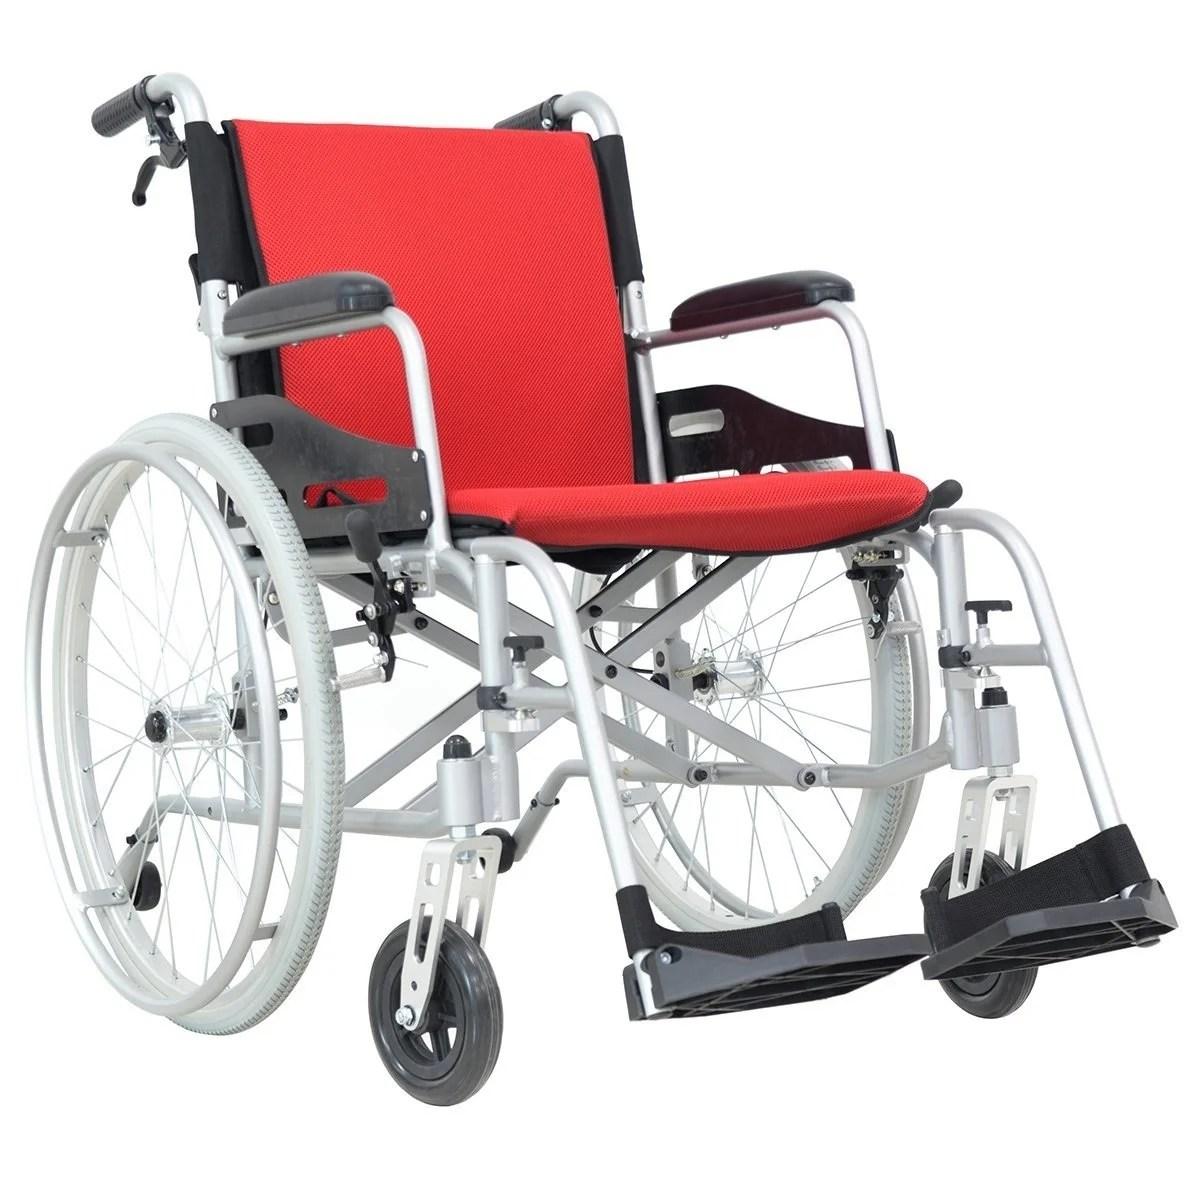 wheelchair manual glider rocking chair target shop hi fortune lightweight medical free